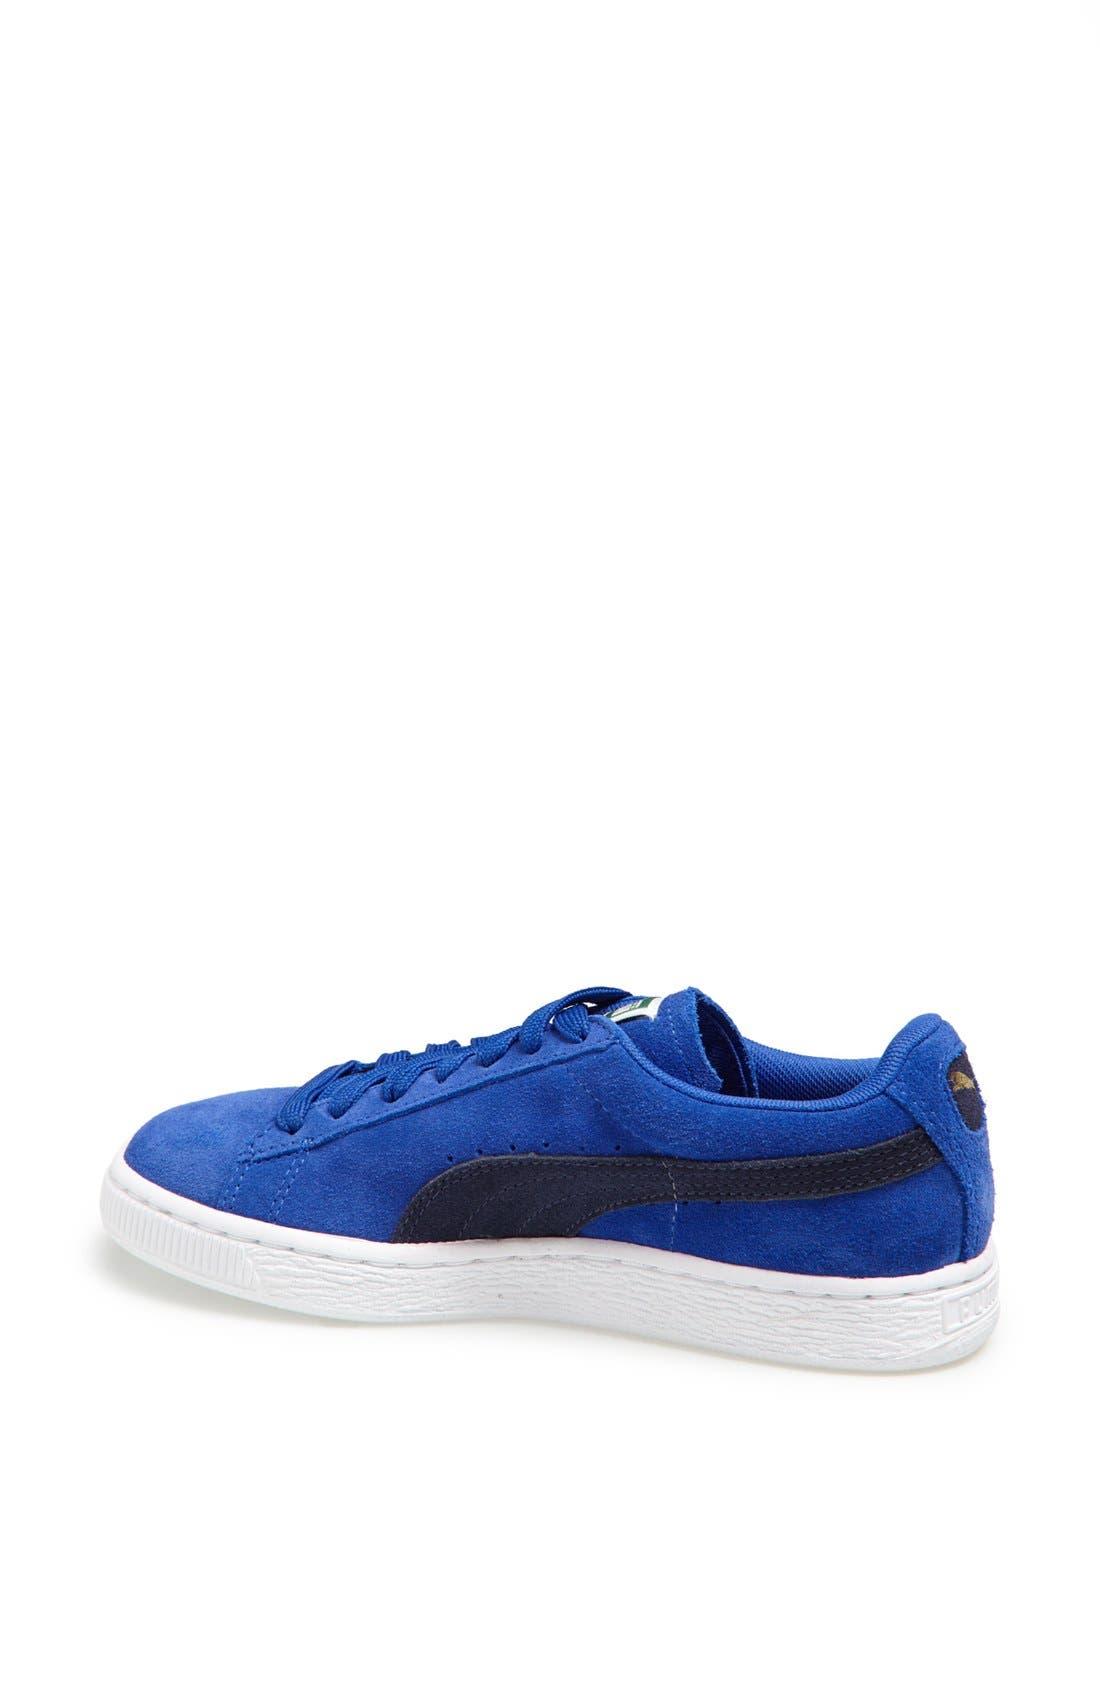 Suede Sneaker,                             Alternate thumbnail 74, color,